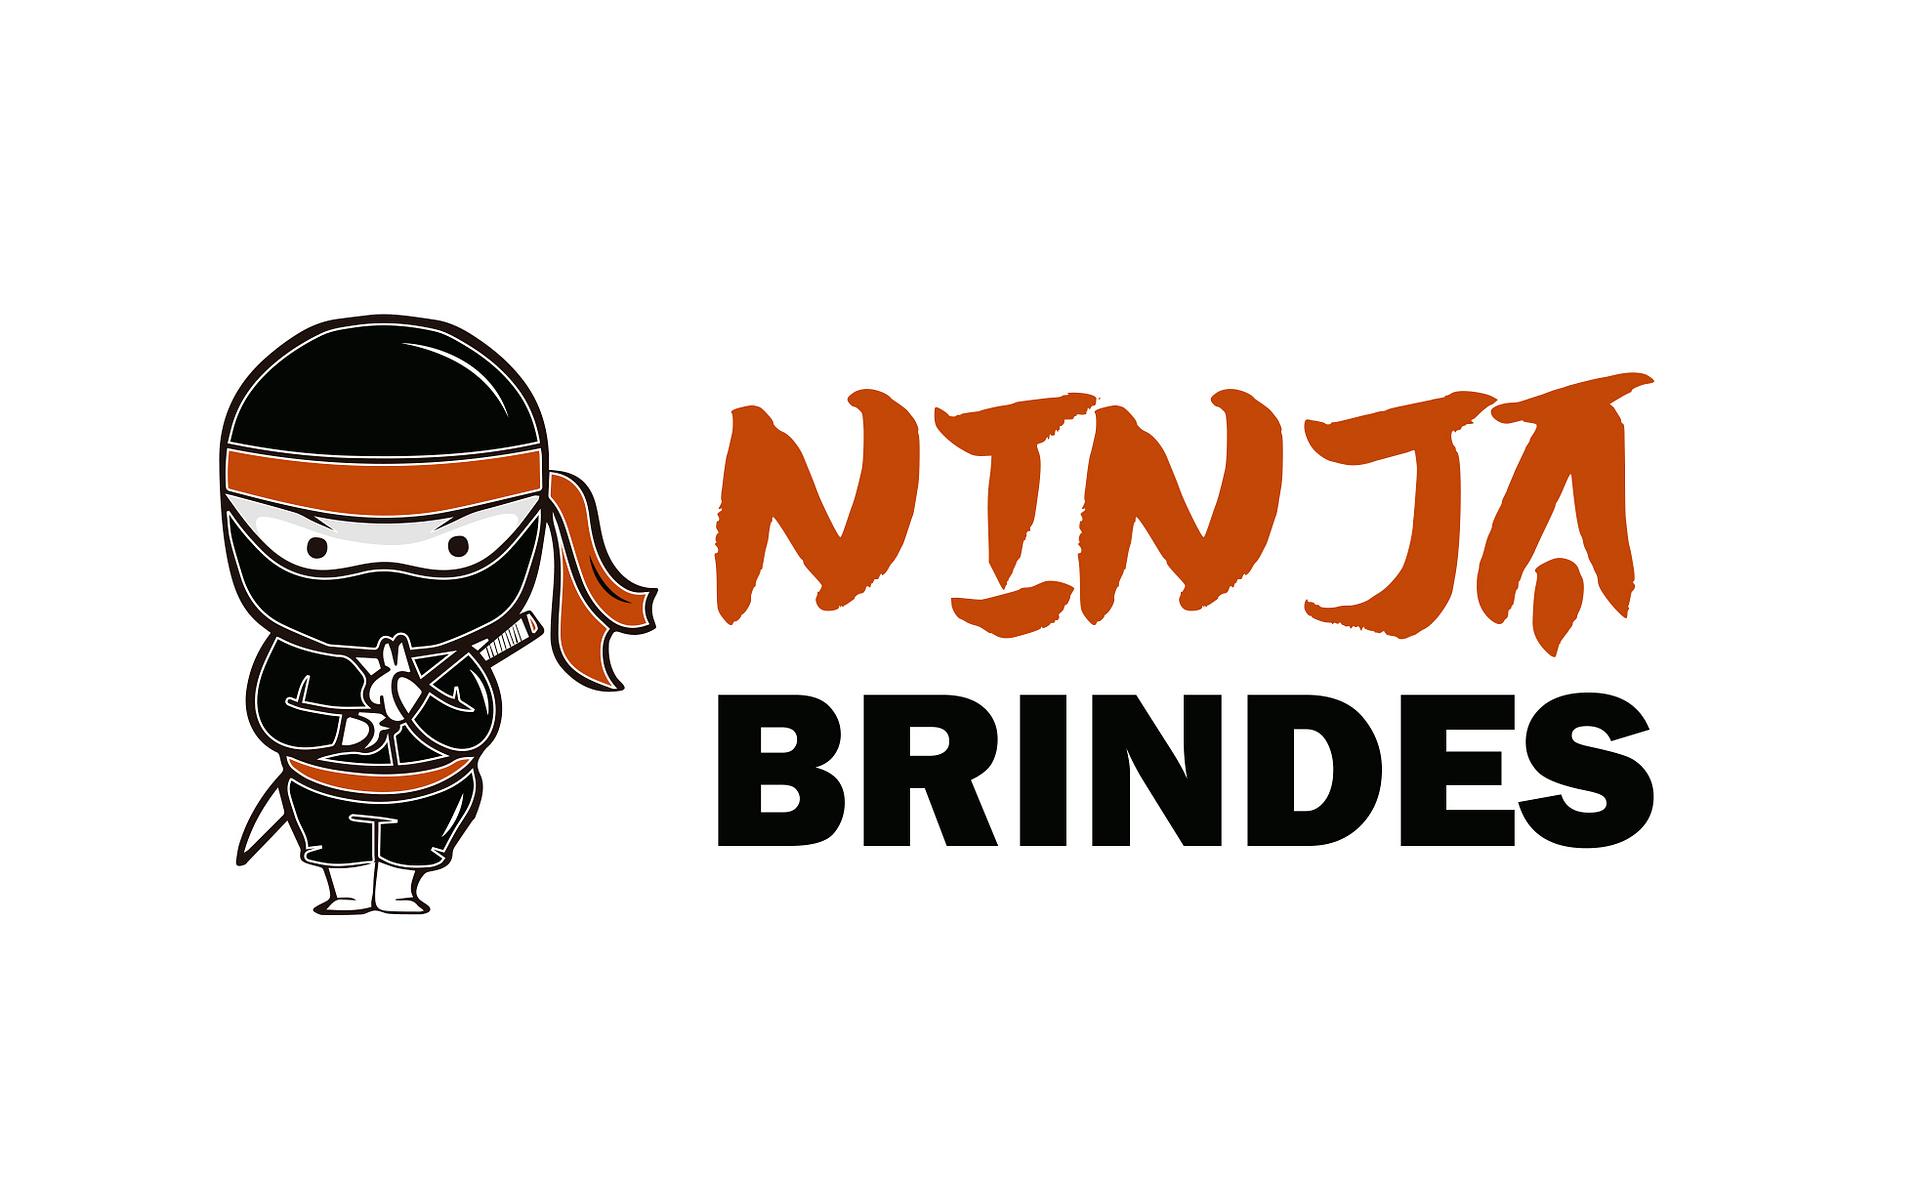 Blog - Ninja Brindes